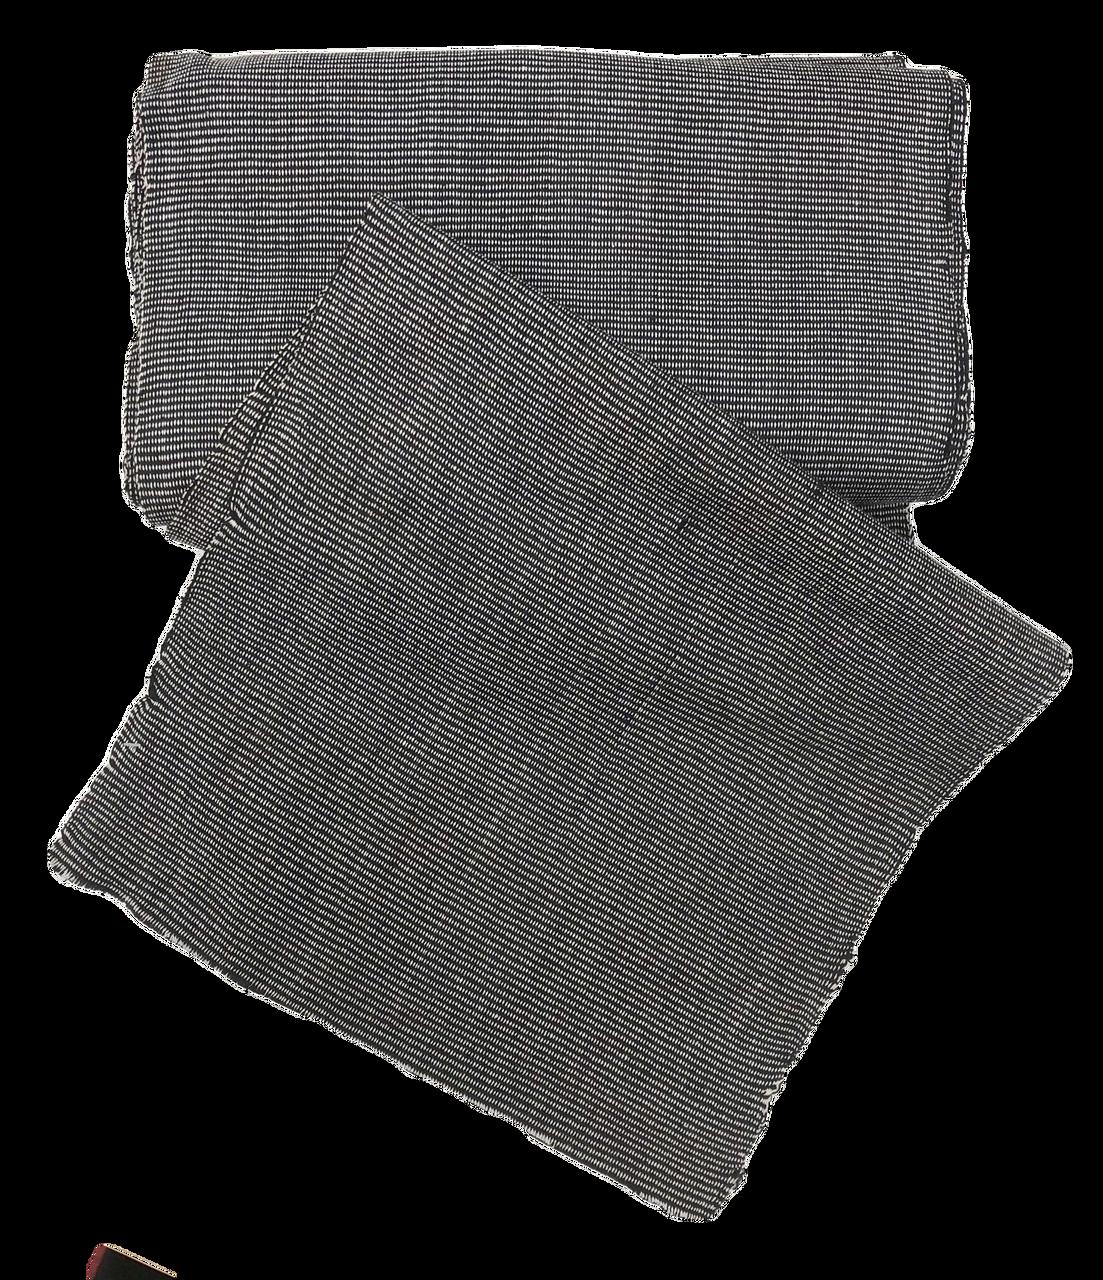 "African Faso Dan Fani Handmade Woven Black/White Cotton Fabric 12"" x 7 Yard"